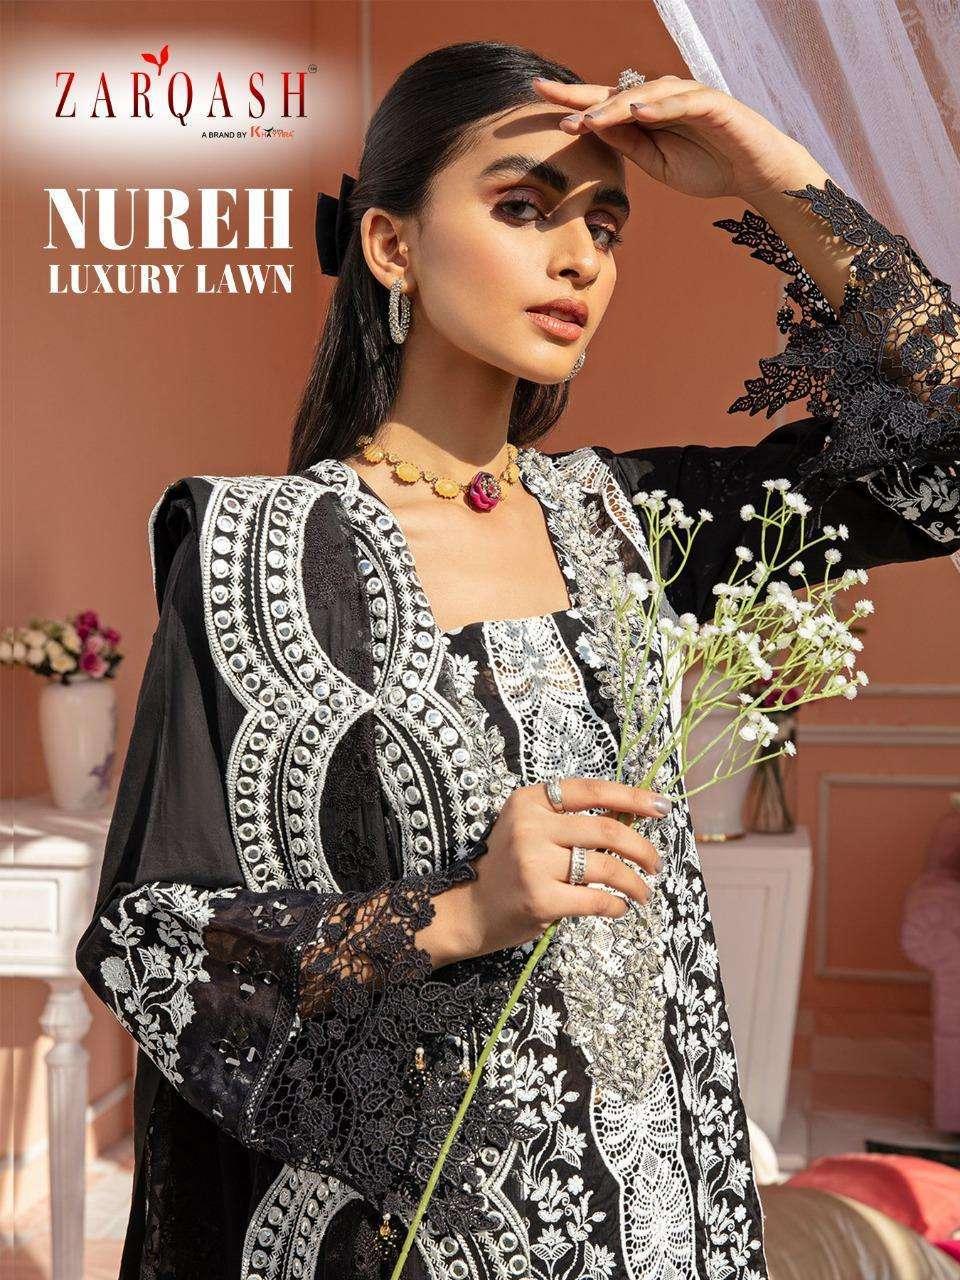 zarqash nureh luxury lawn cotton embroidery pakistani dresses concept new design 2021